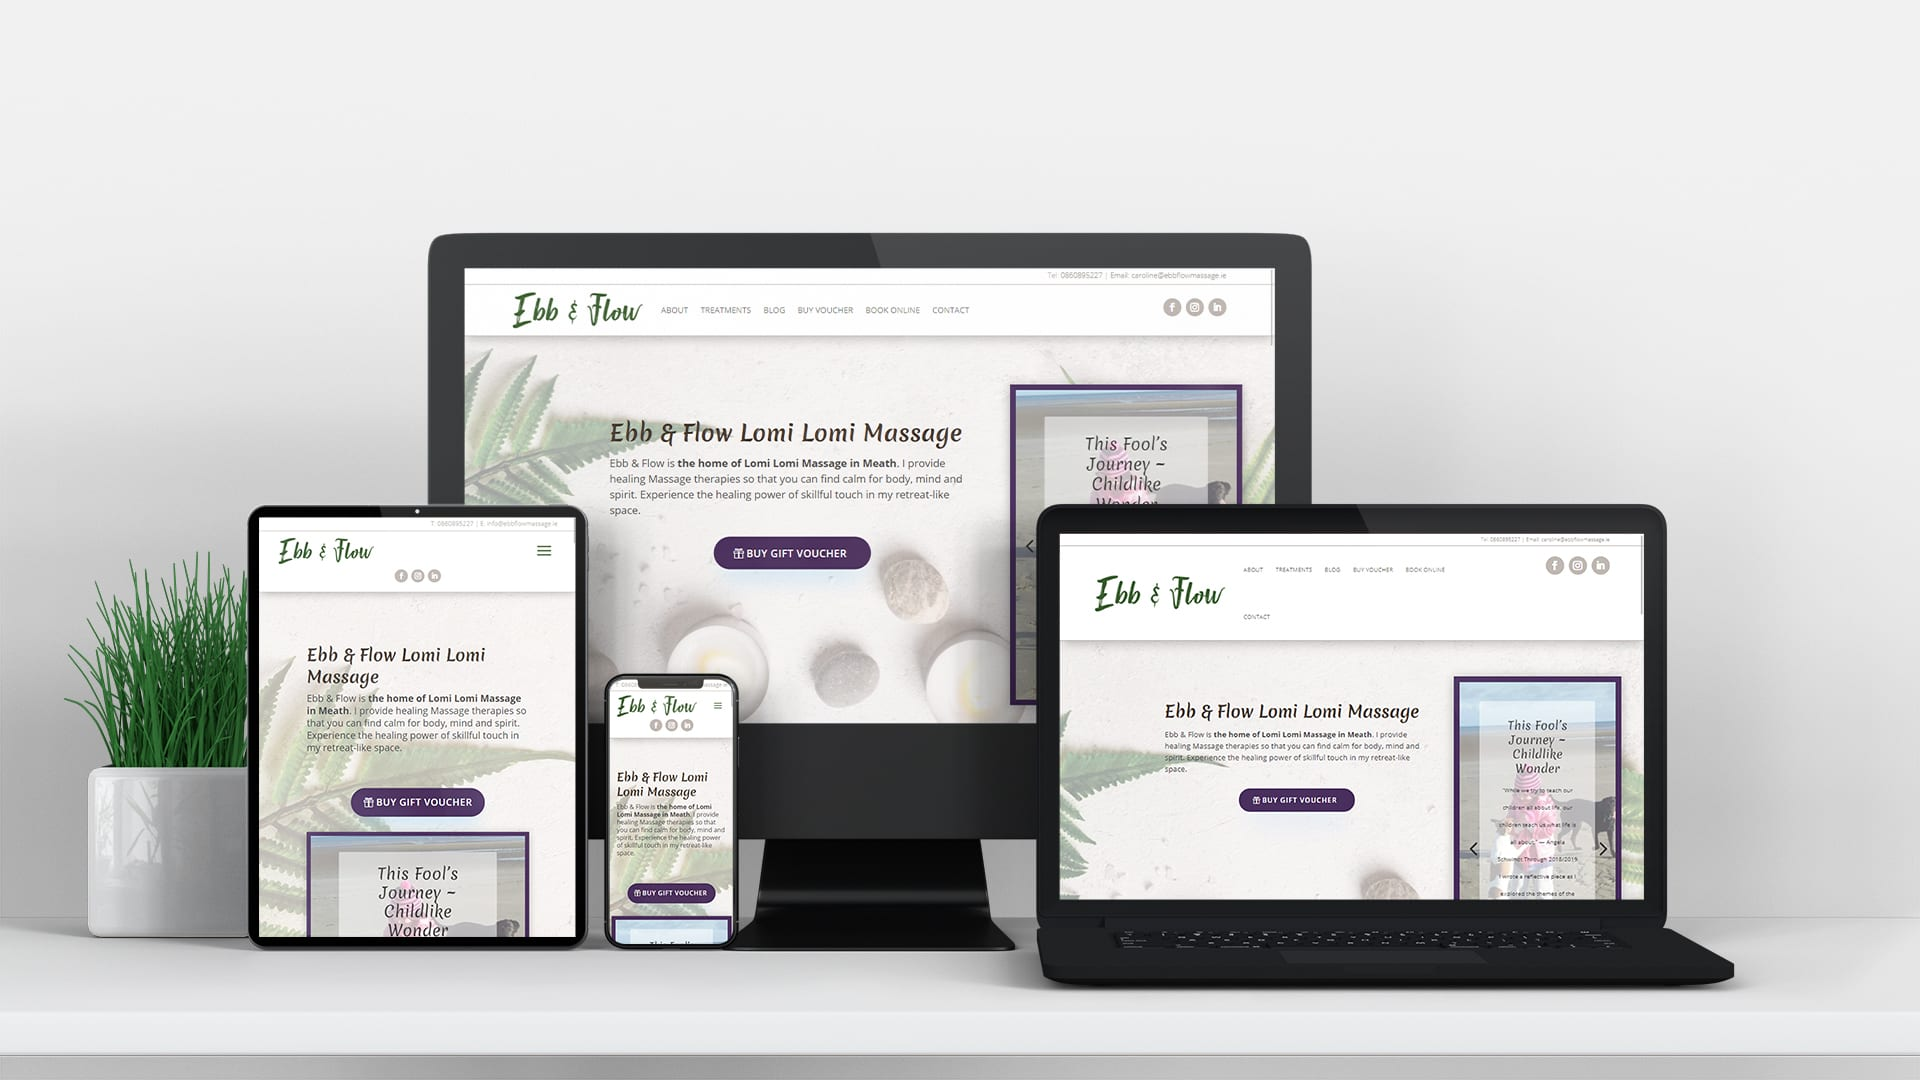 ebb and flow lomi lomi massage holistic massage Ireland design burst website design